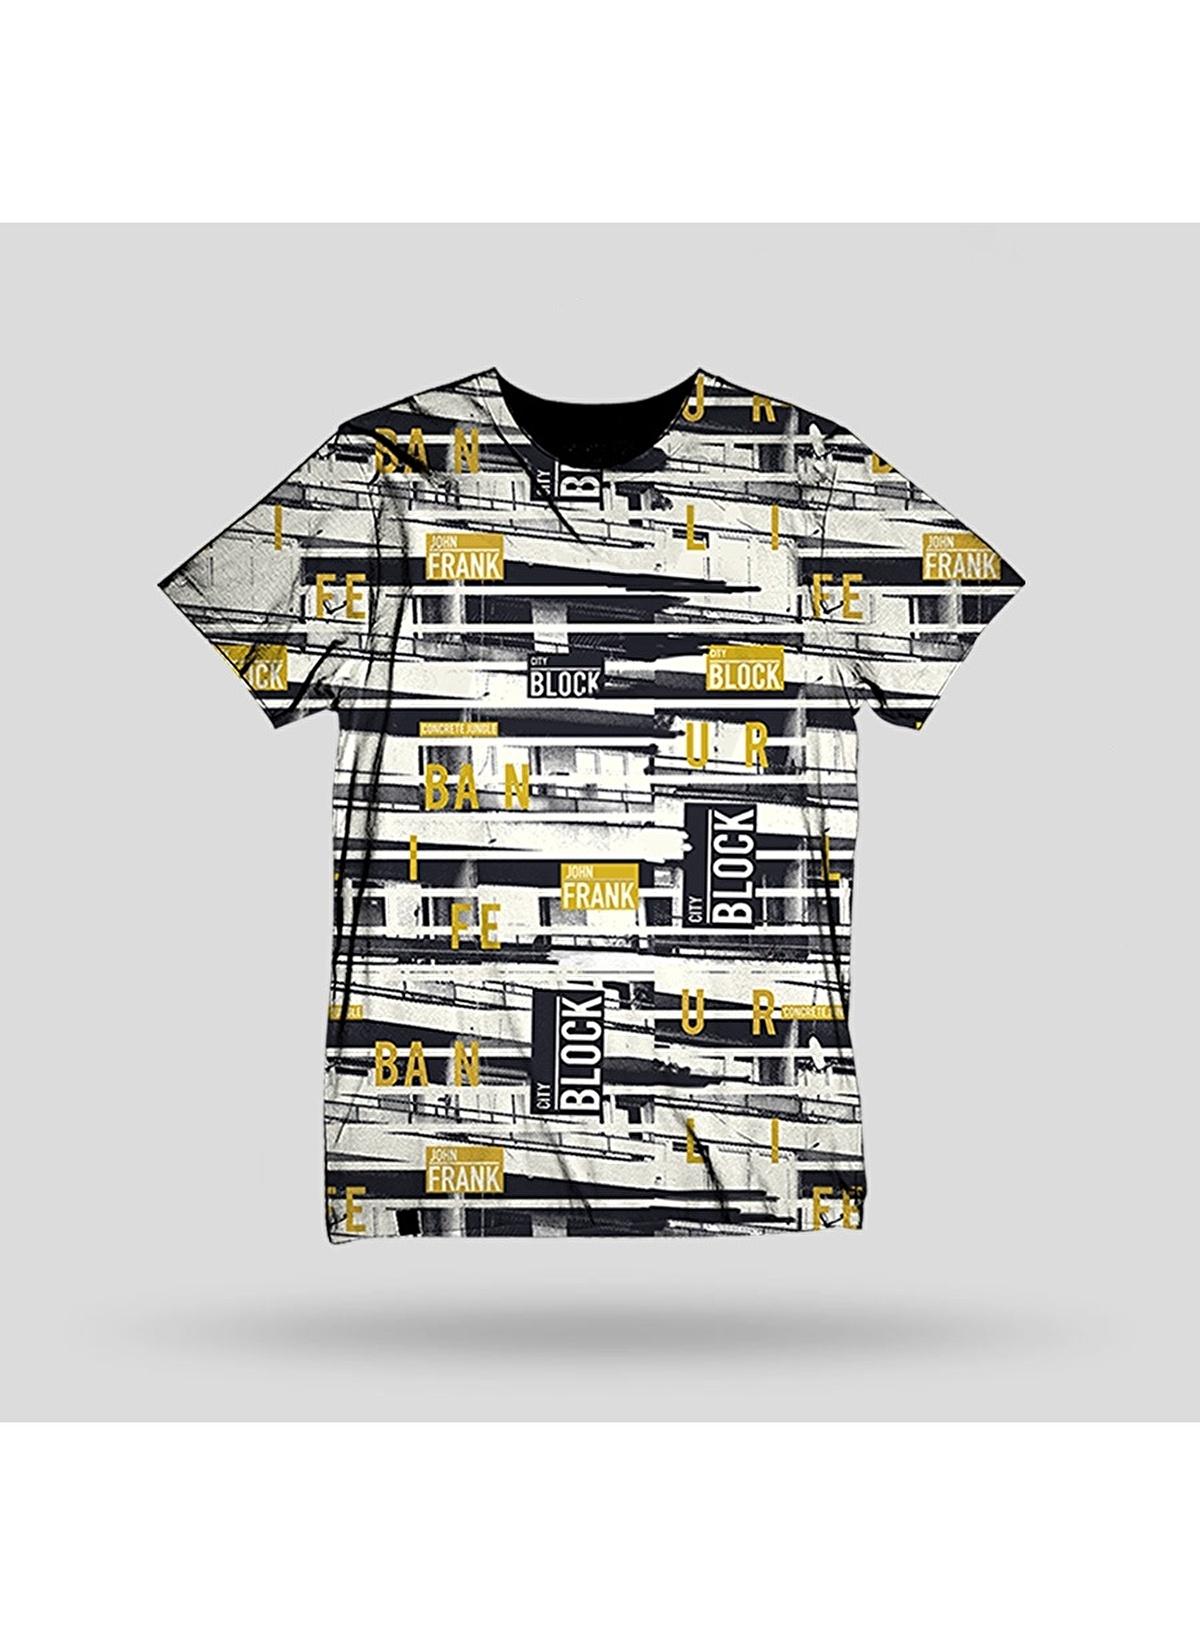 John Frank Tişört Jftd35-block Baskılı Dijital T-shirt – 79.99 TL